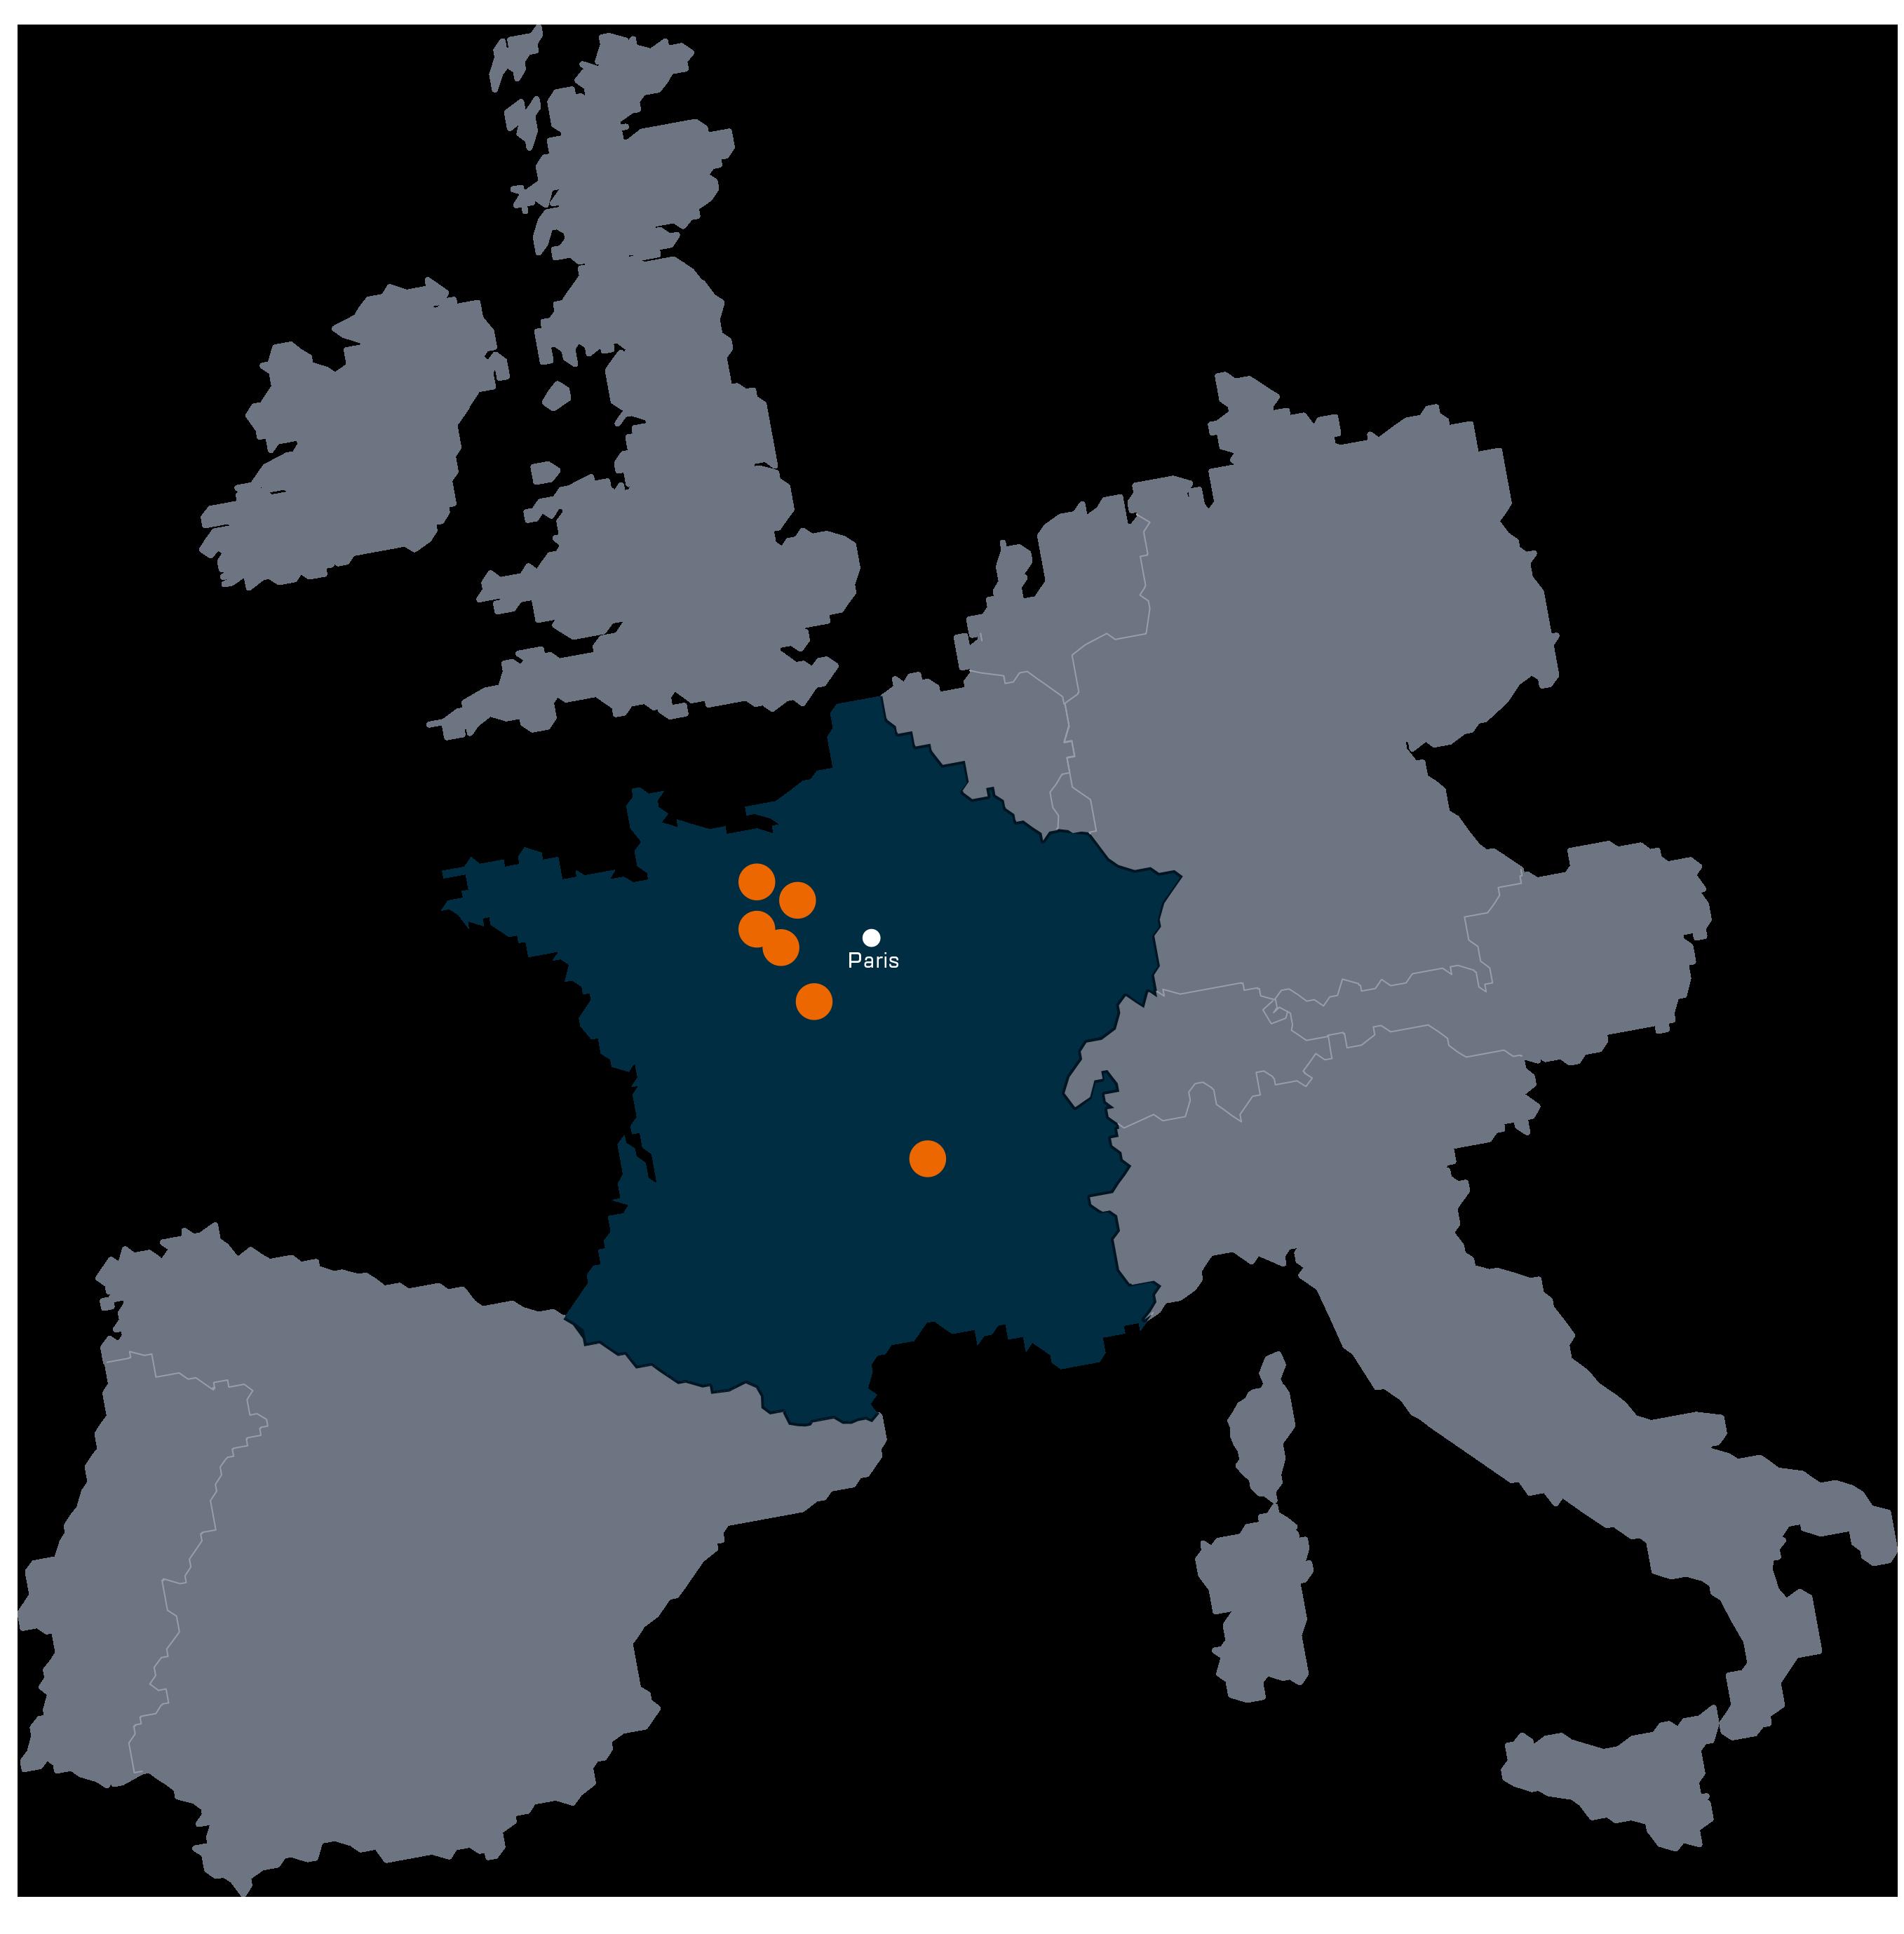 Carte des implantations des usines Artub en France